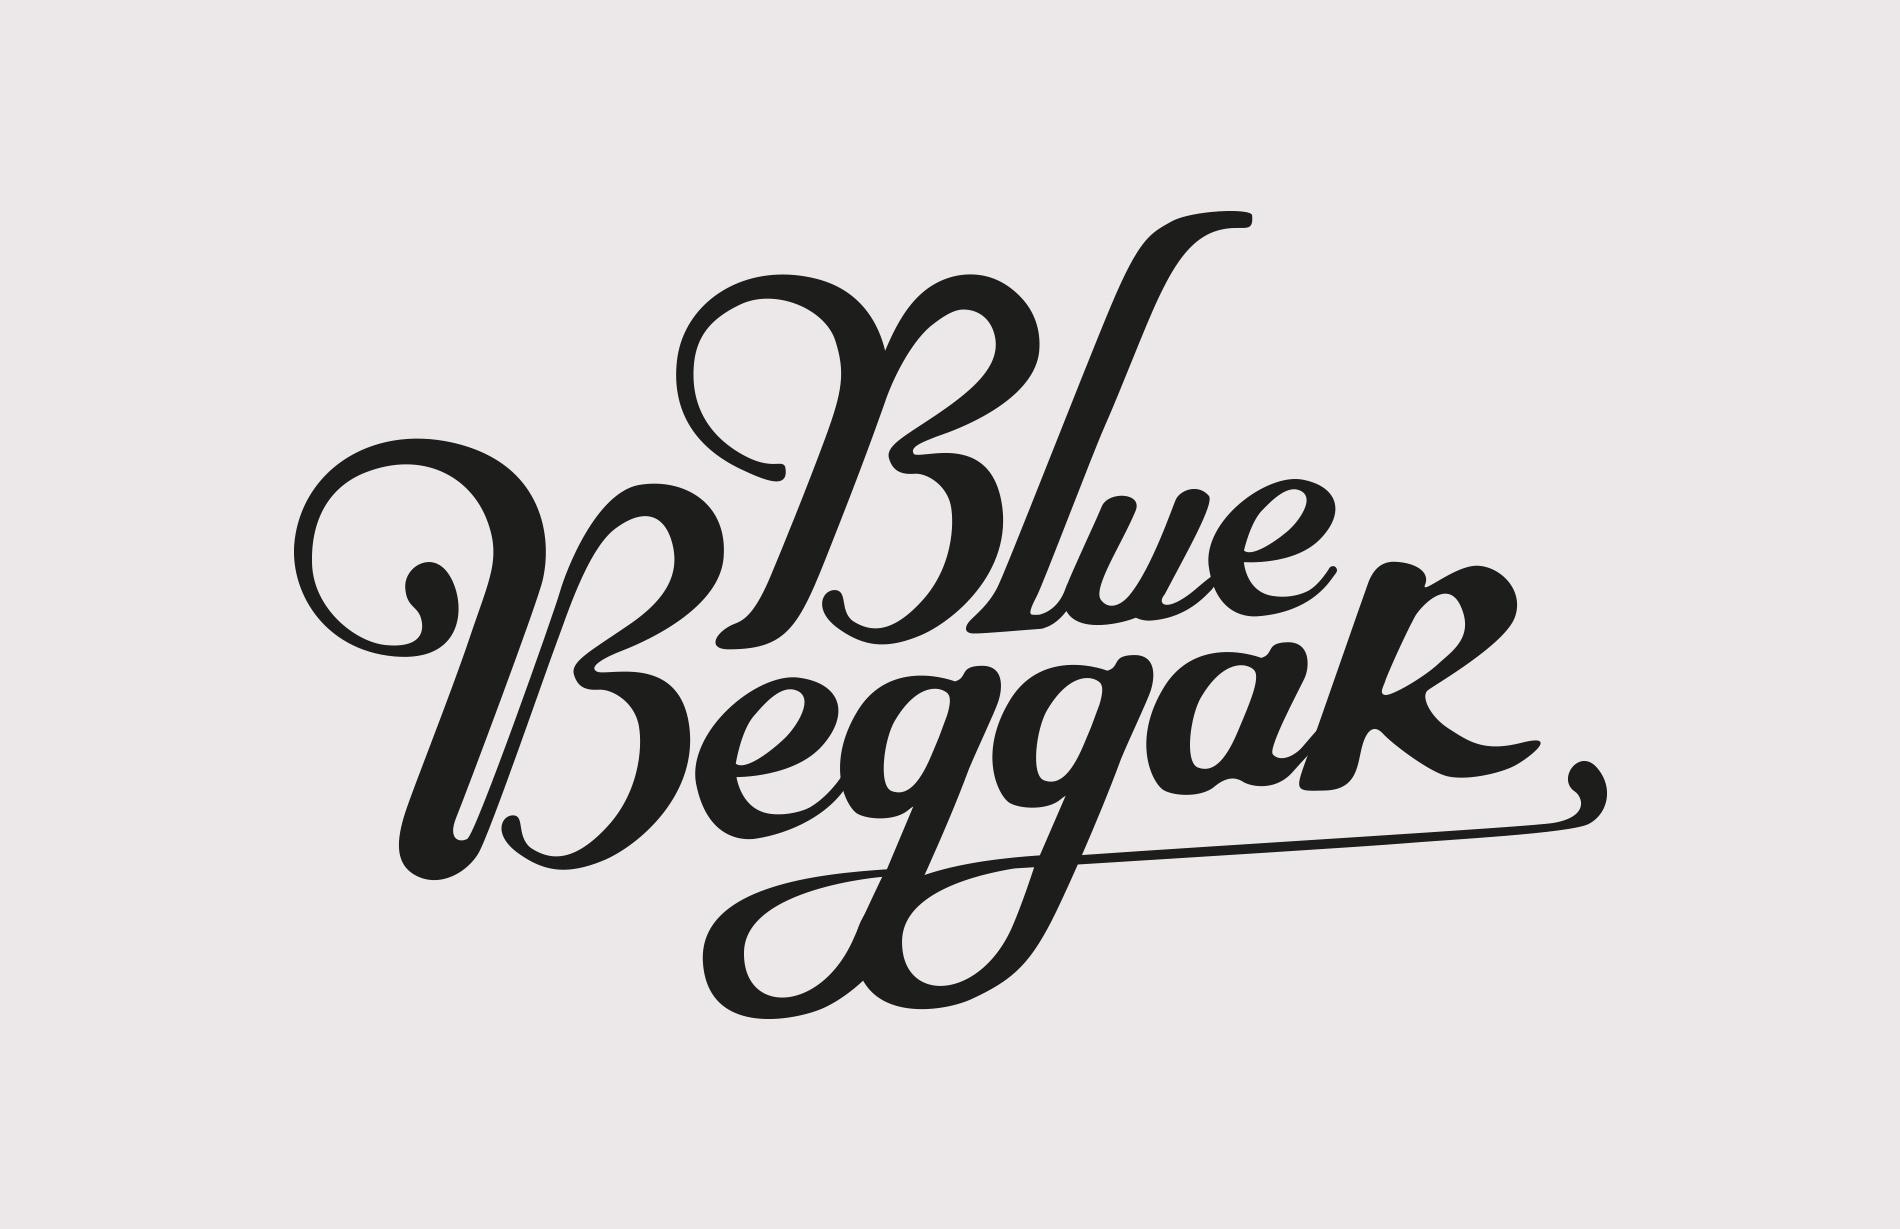 bluebeggar